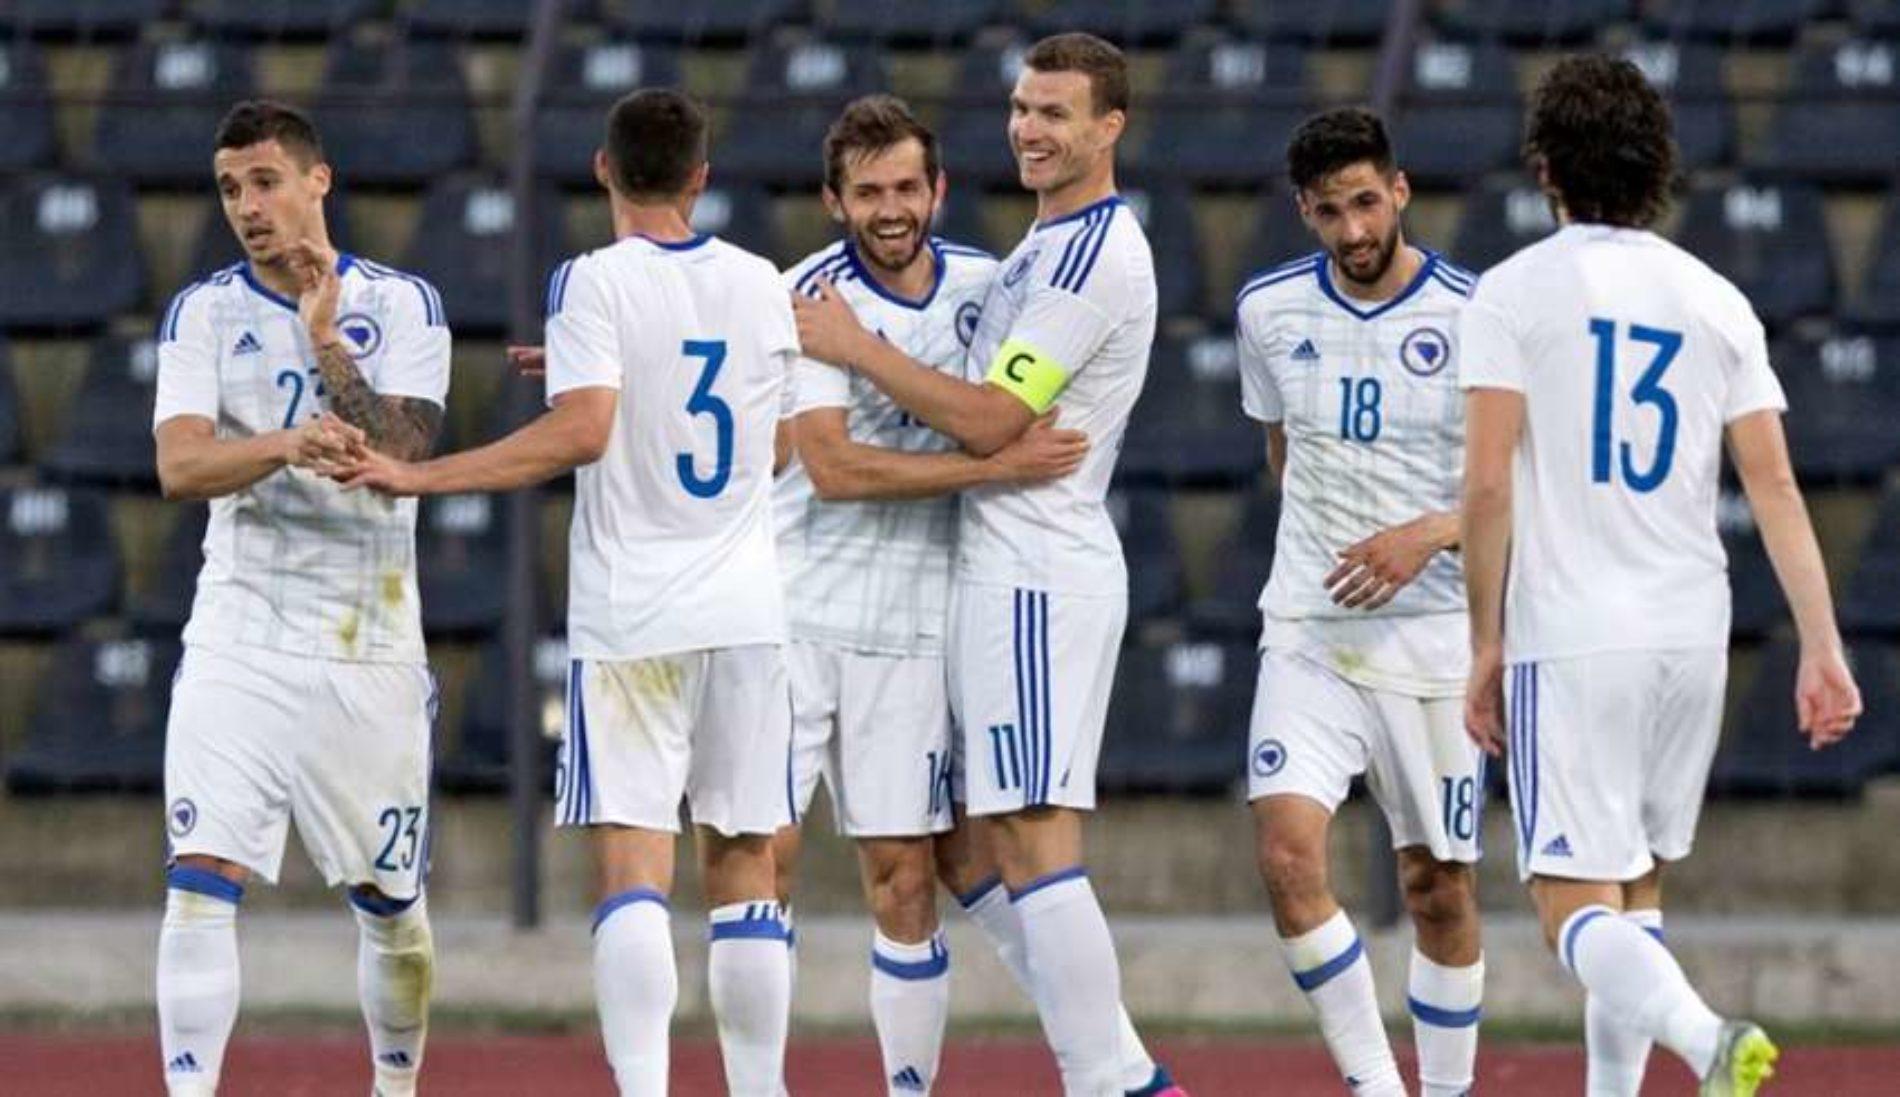 Zmajevi preletjeli zemlju orlova: Albanija 1-2 Bosna i Hercegovina (Video)